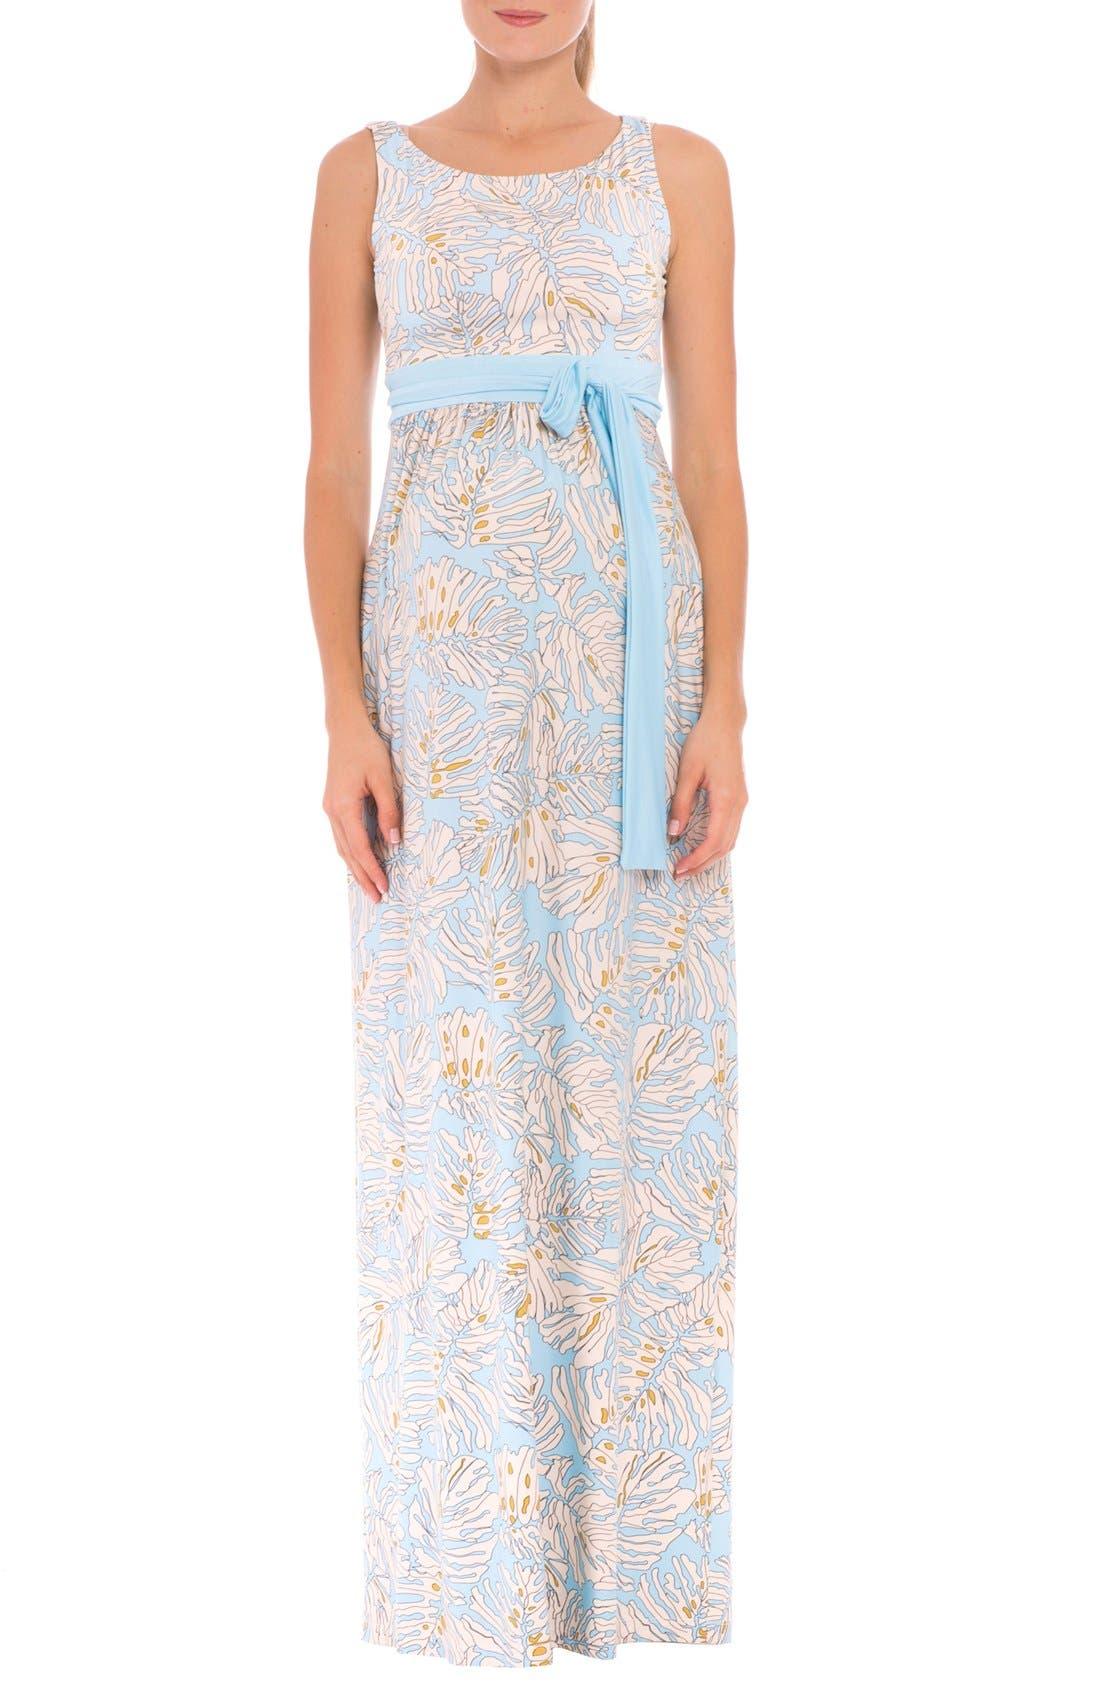 Olian 'Scarlet' Boatneck Maternity Maxi Dress